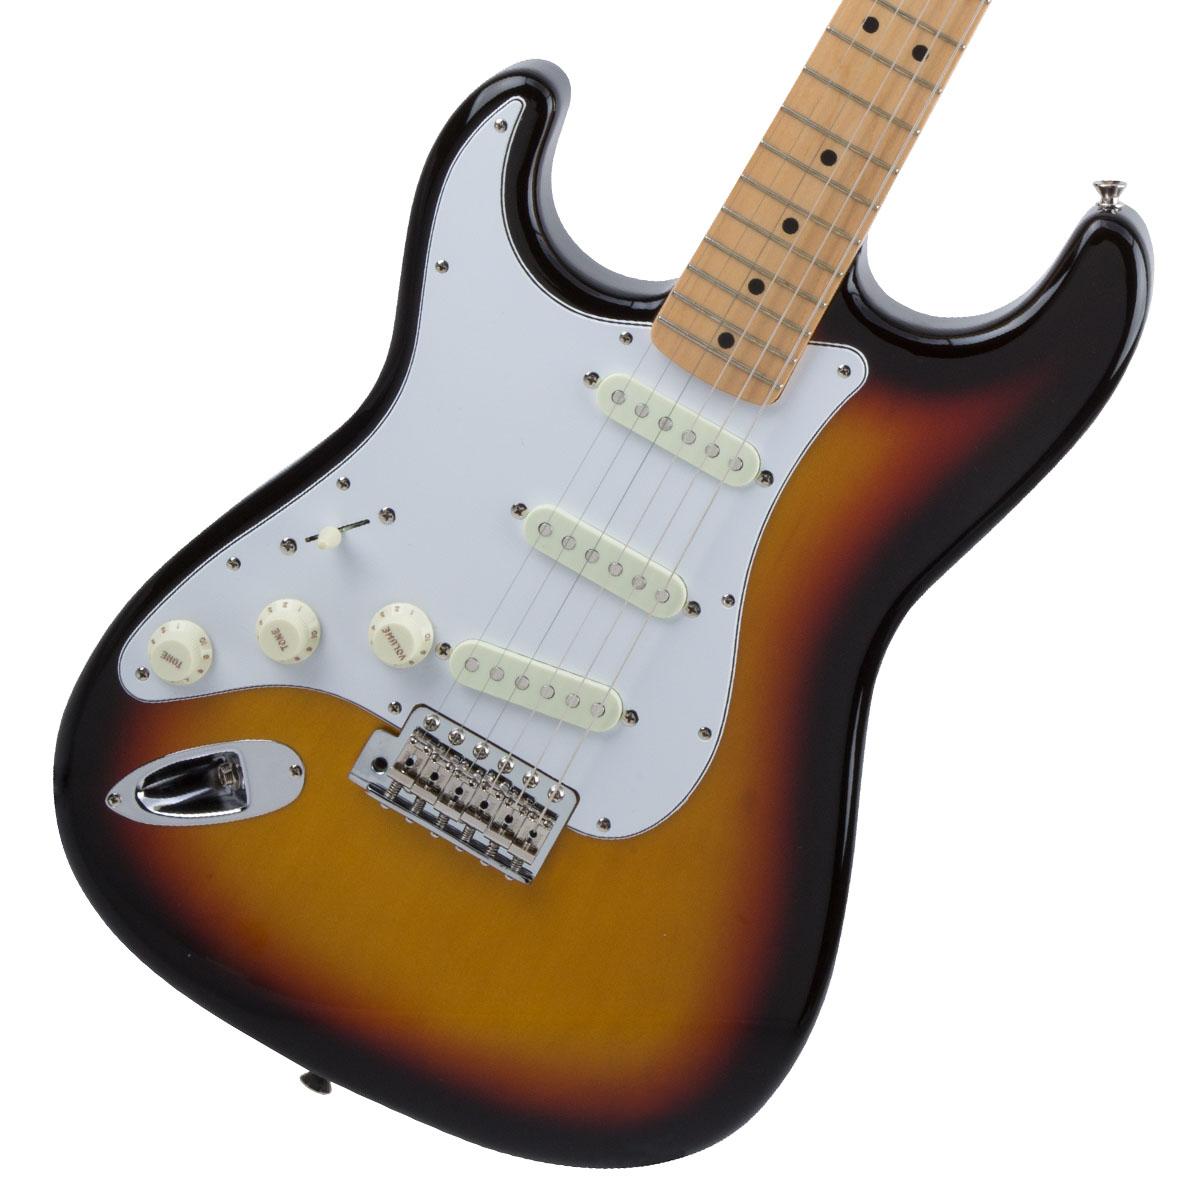 Fender / Made in Japan Traditional 68s Stratocaster Left-Hand 3-Color Sunburst 左利き用【お取り寄せ商品】《カスタムショップのお手入れ用品を進呈/+671038200》